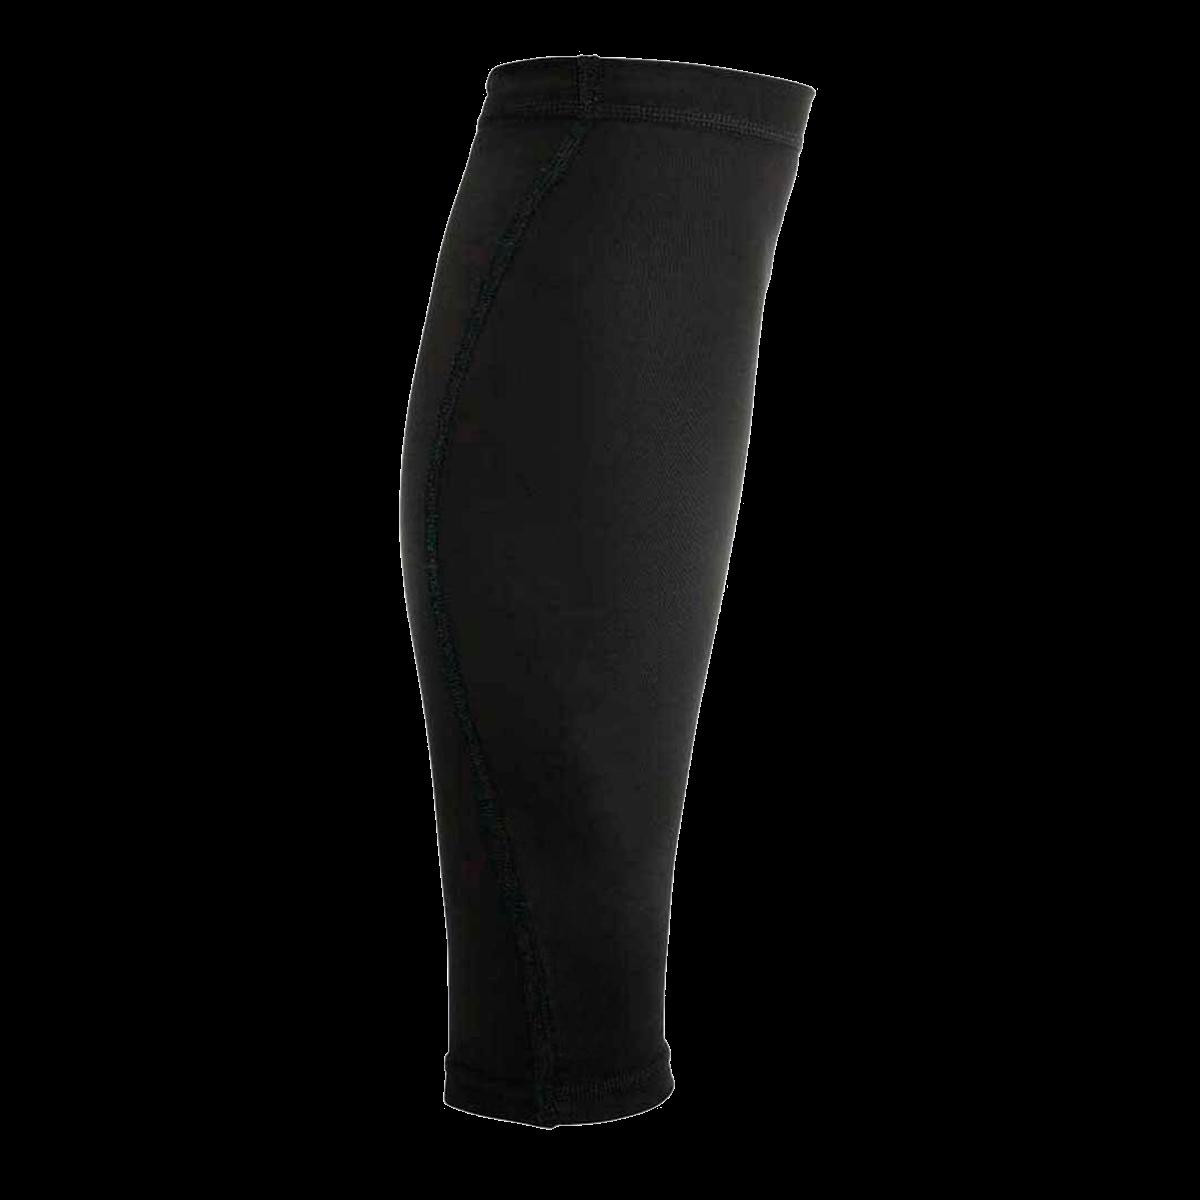 Calf sleeve